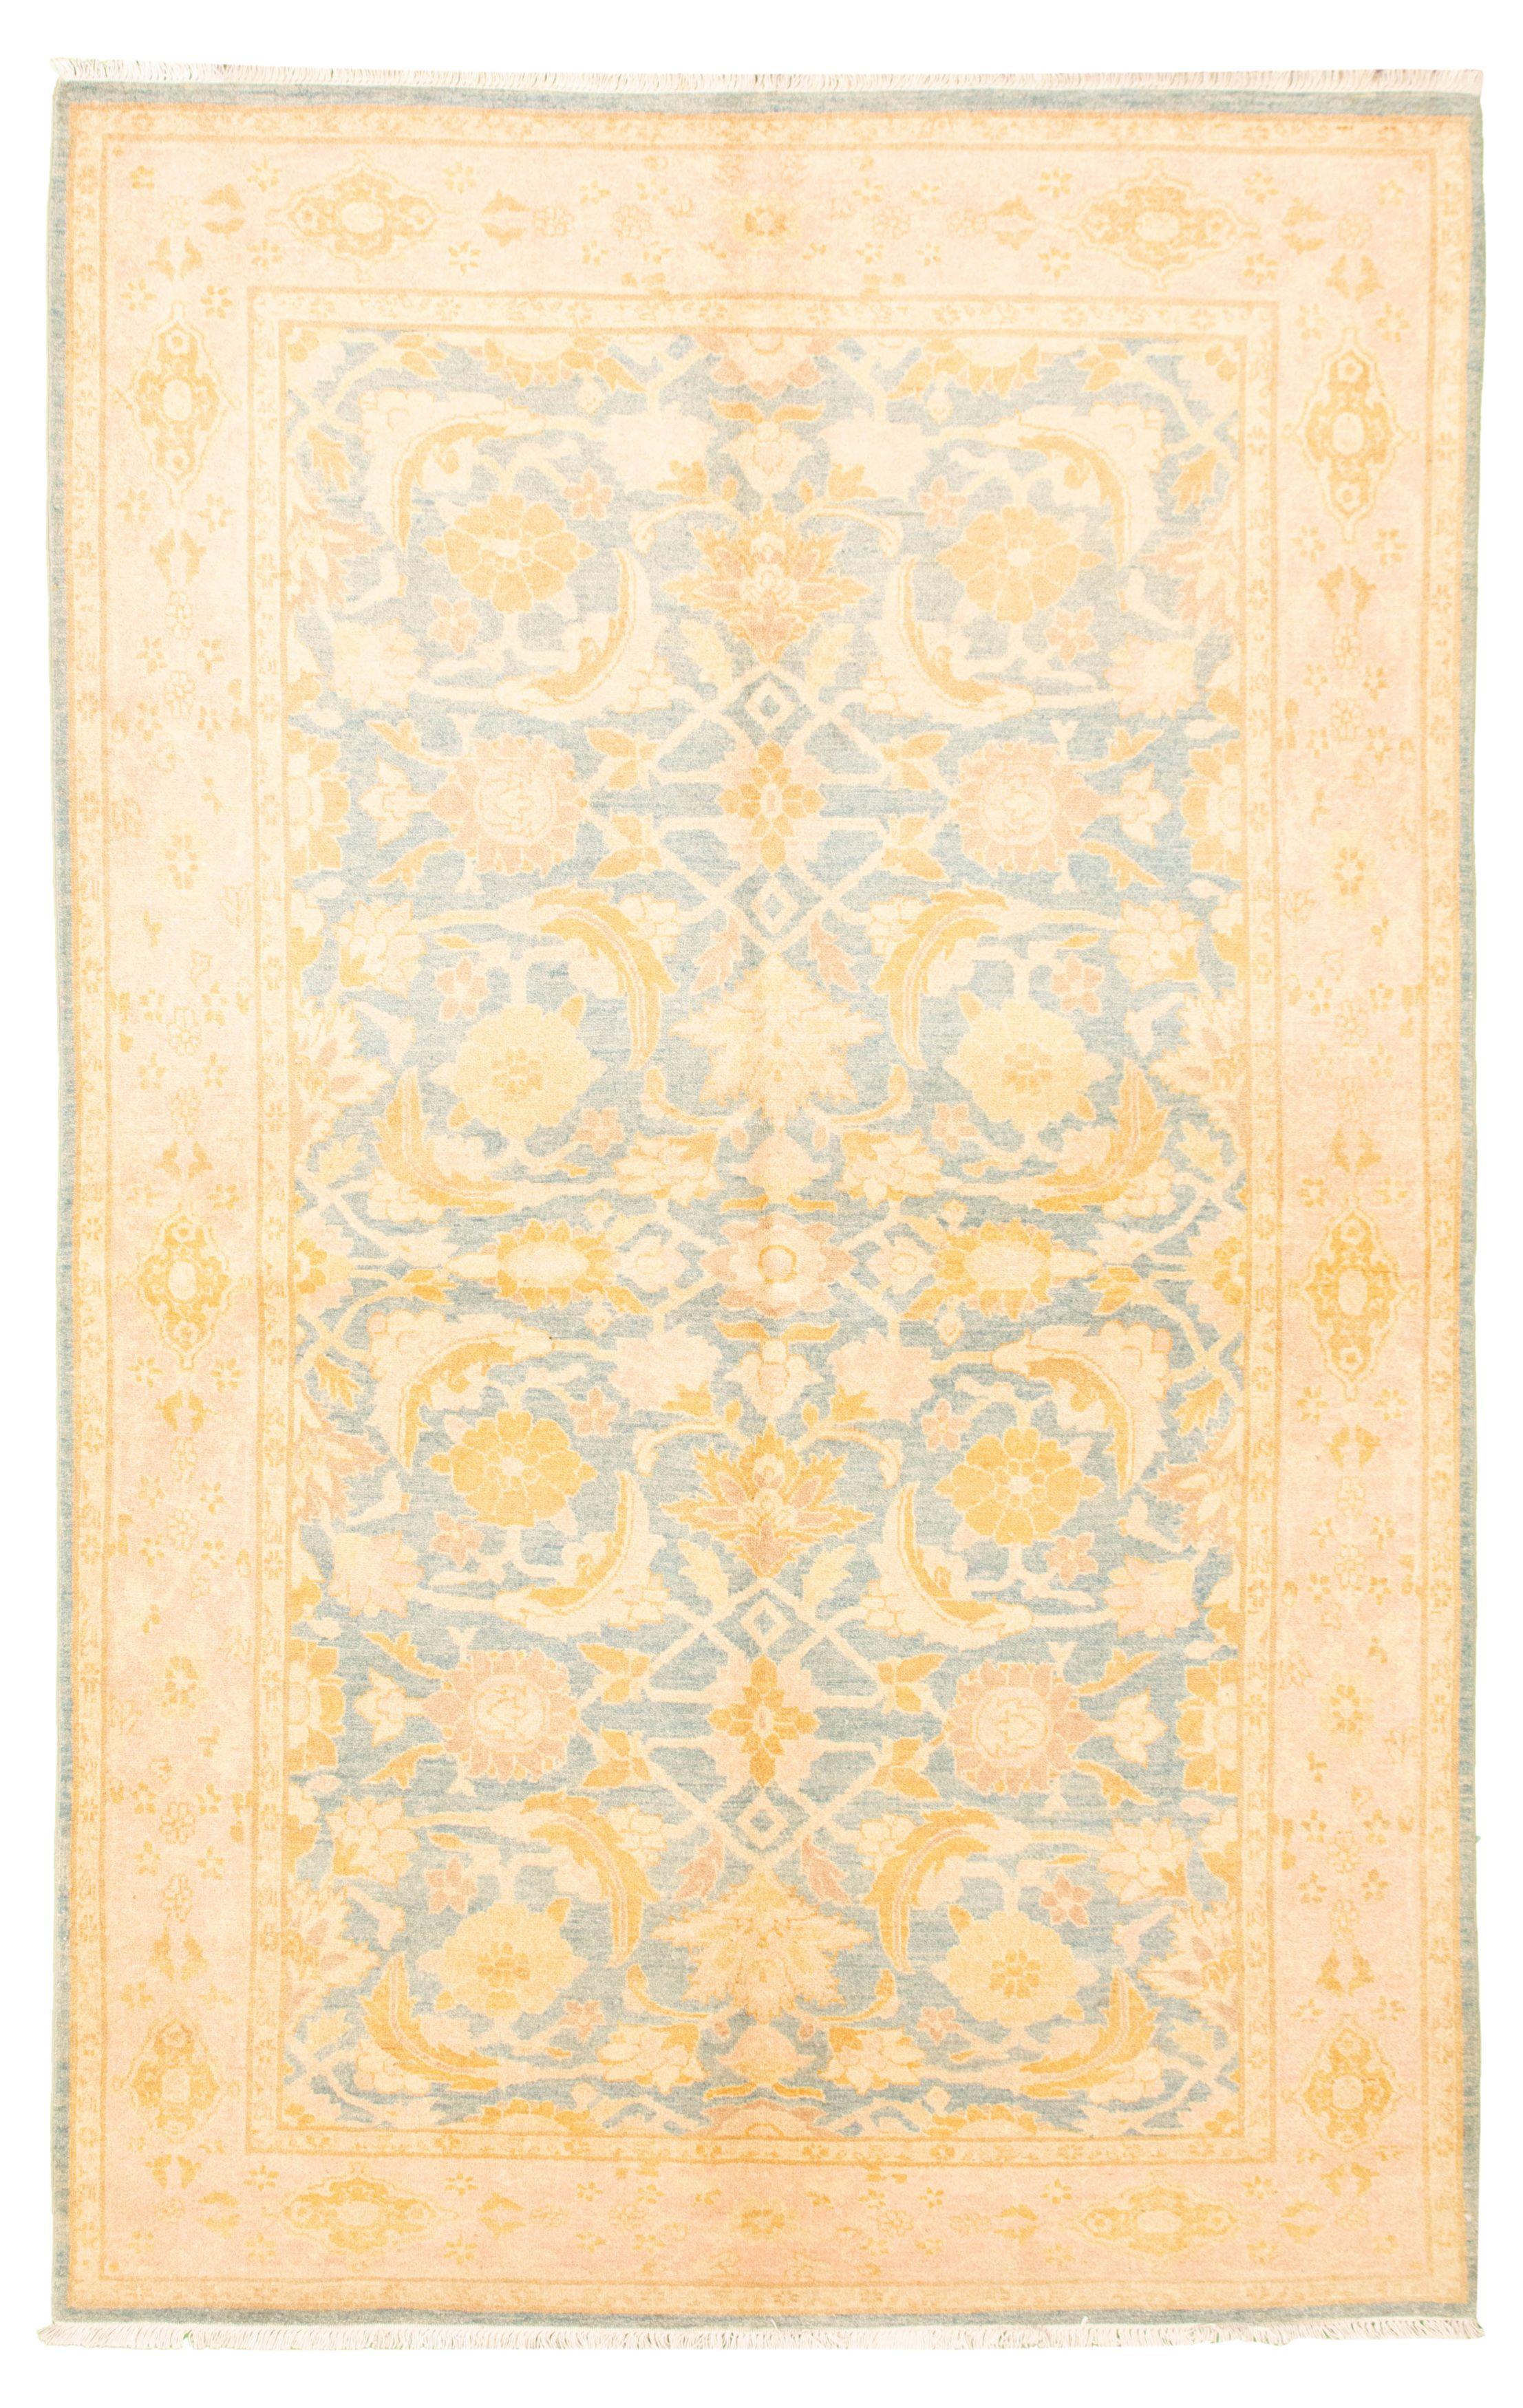 "Hand-knotted Peshawar Oushak Blue Wool Rug 6'2"" x 9'10"" Size: 6'2"" x 9'10"""